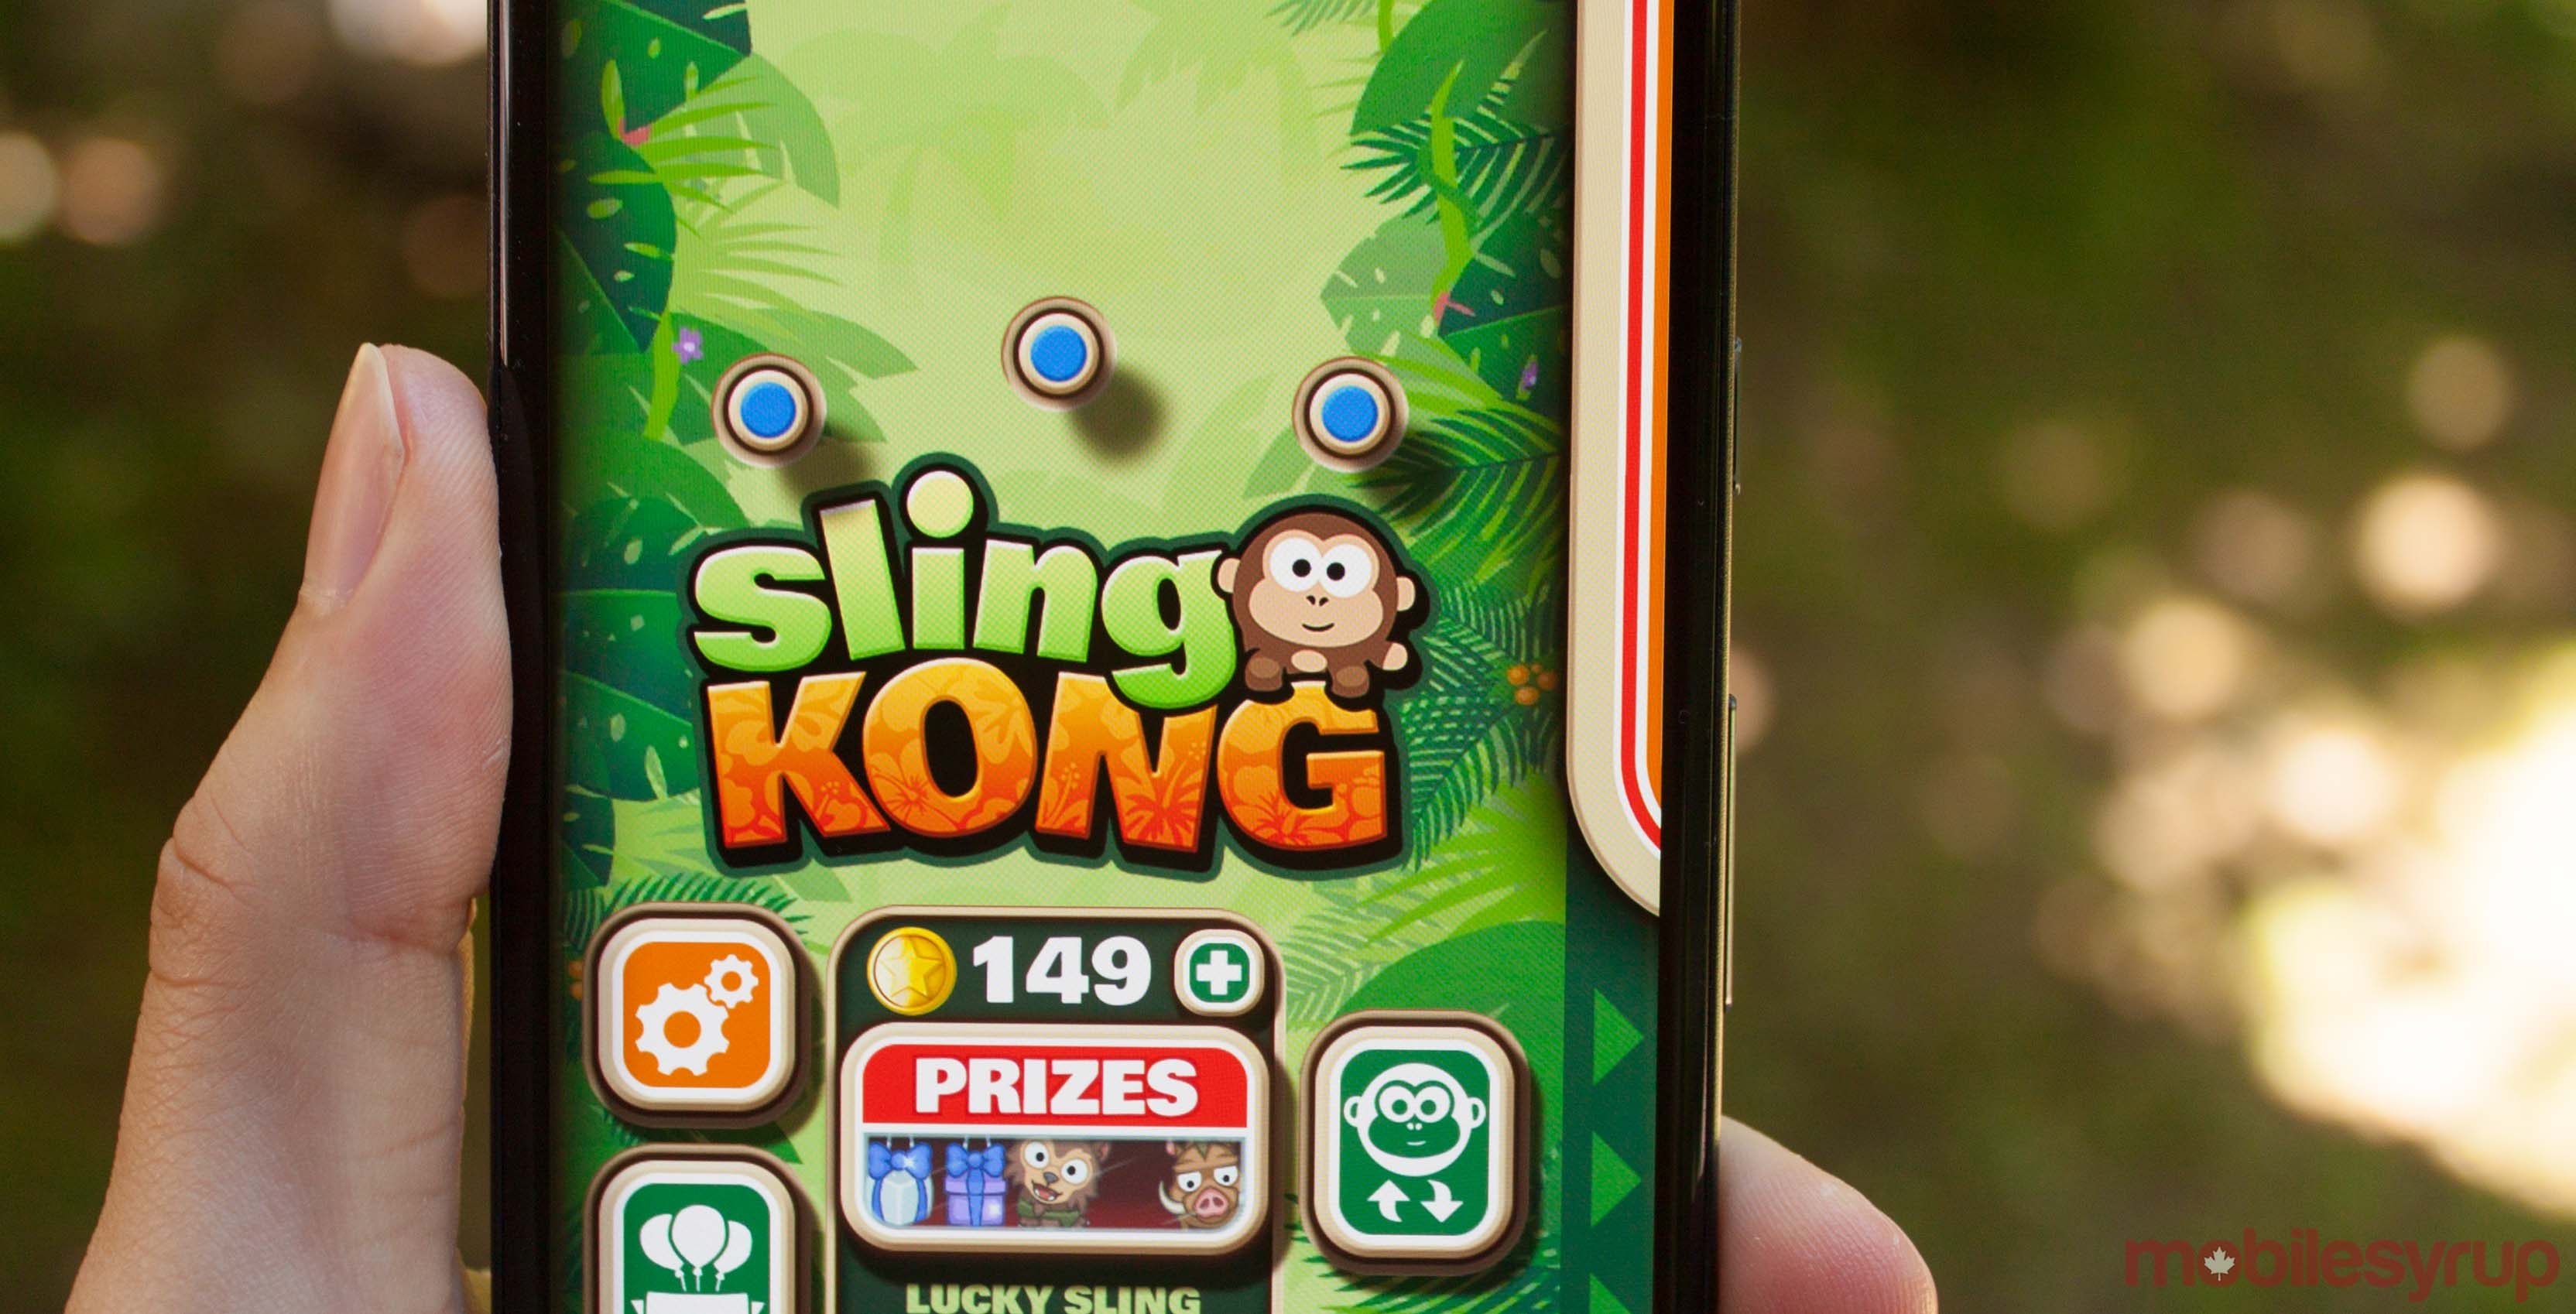 Sling Kong on a Pixel 2 XL